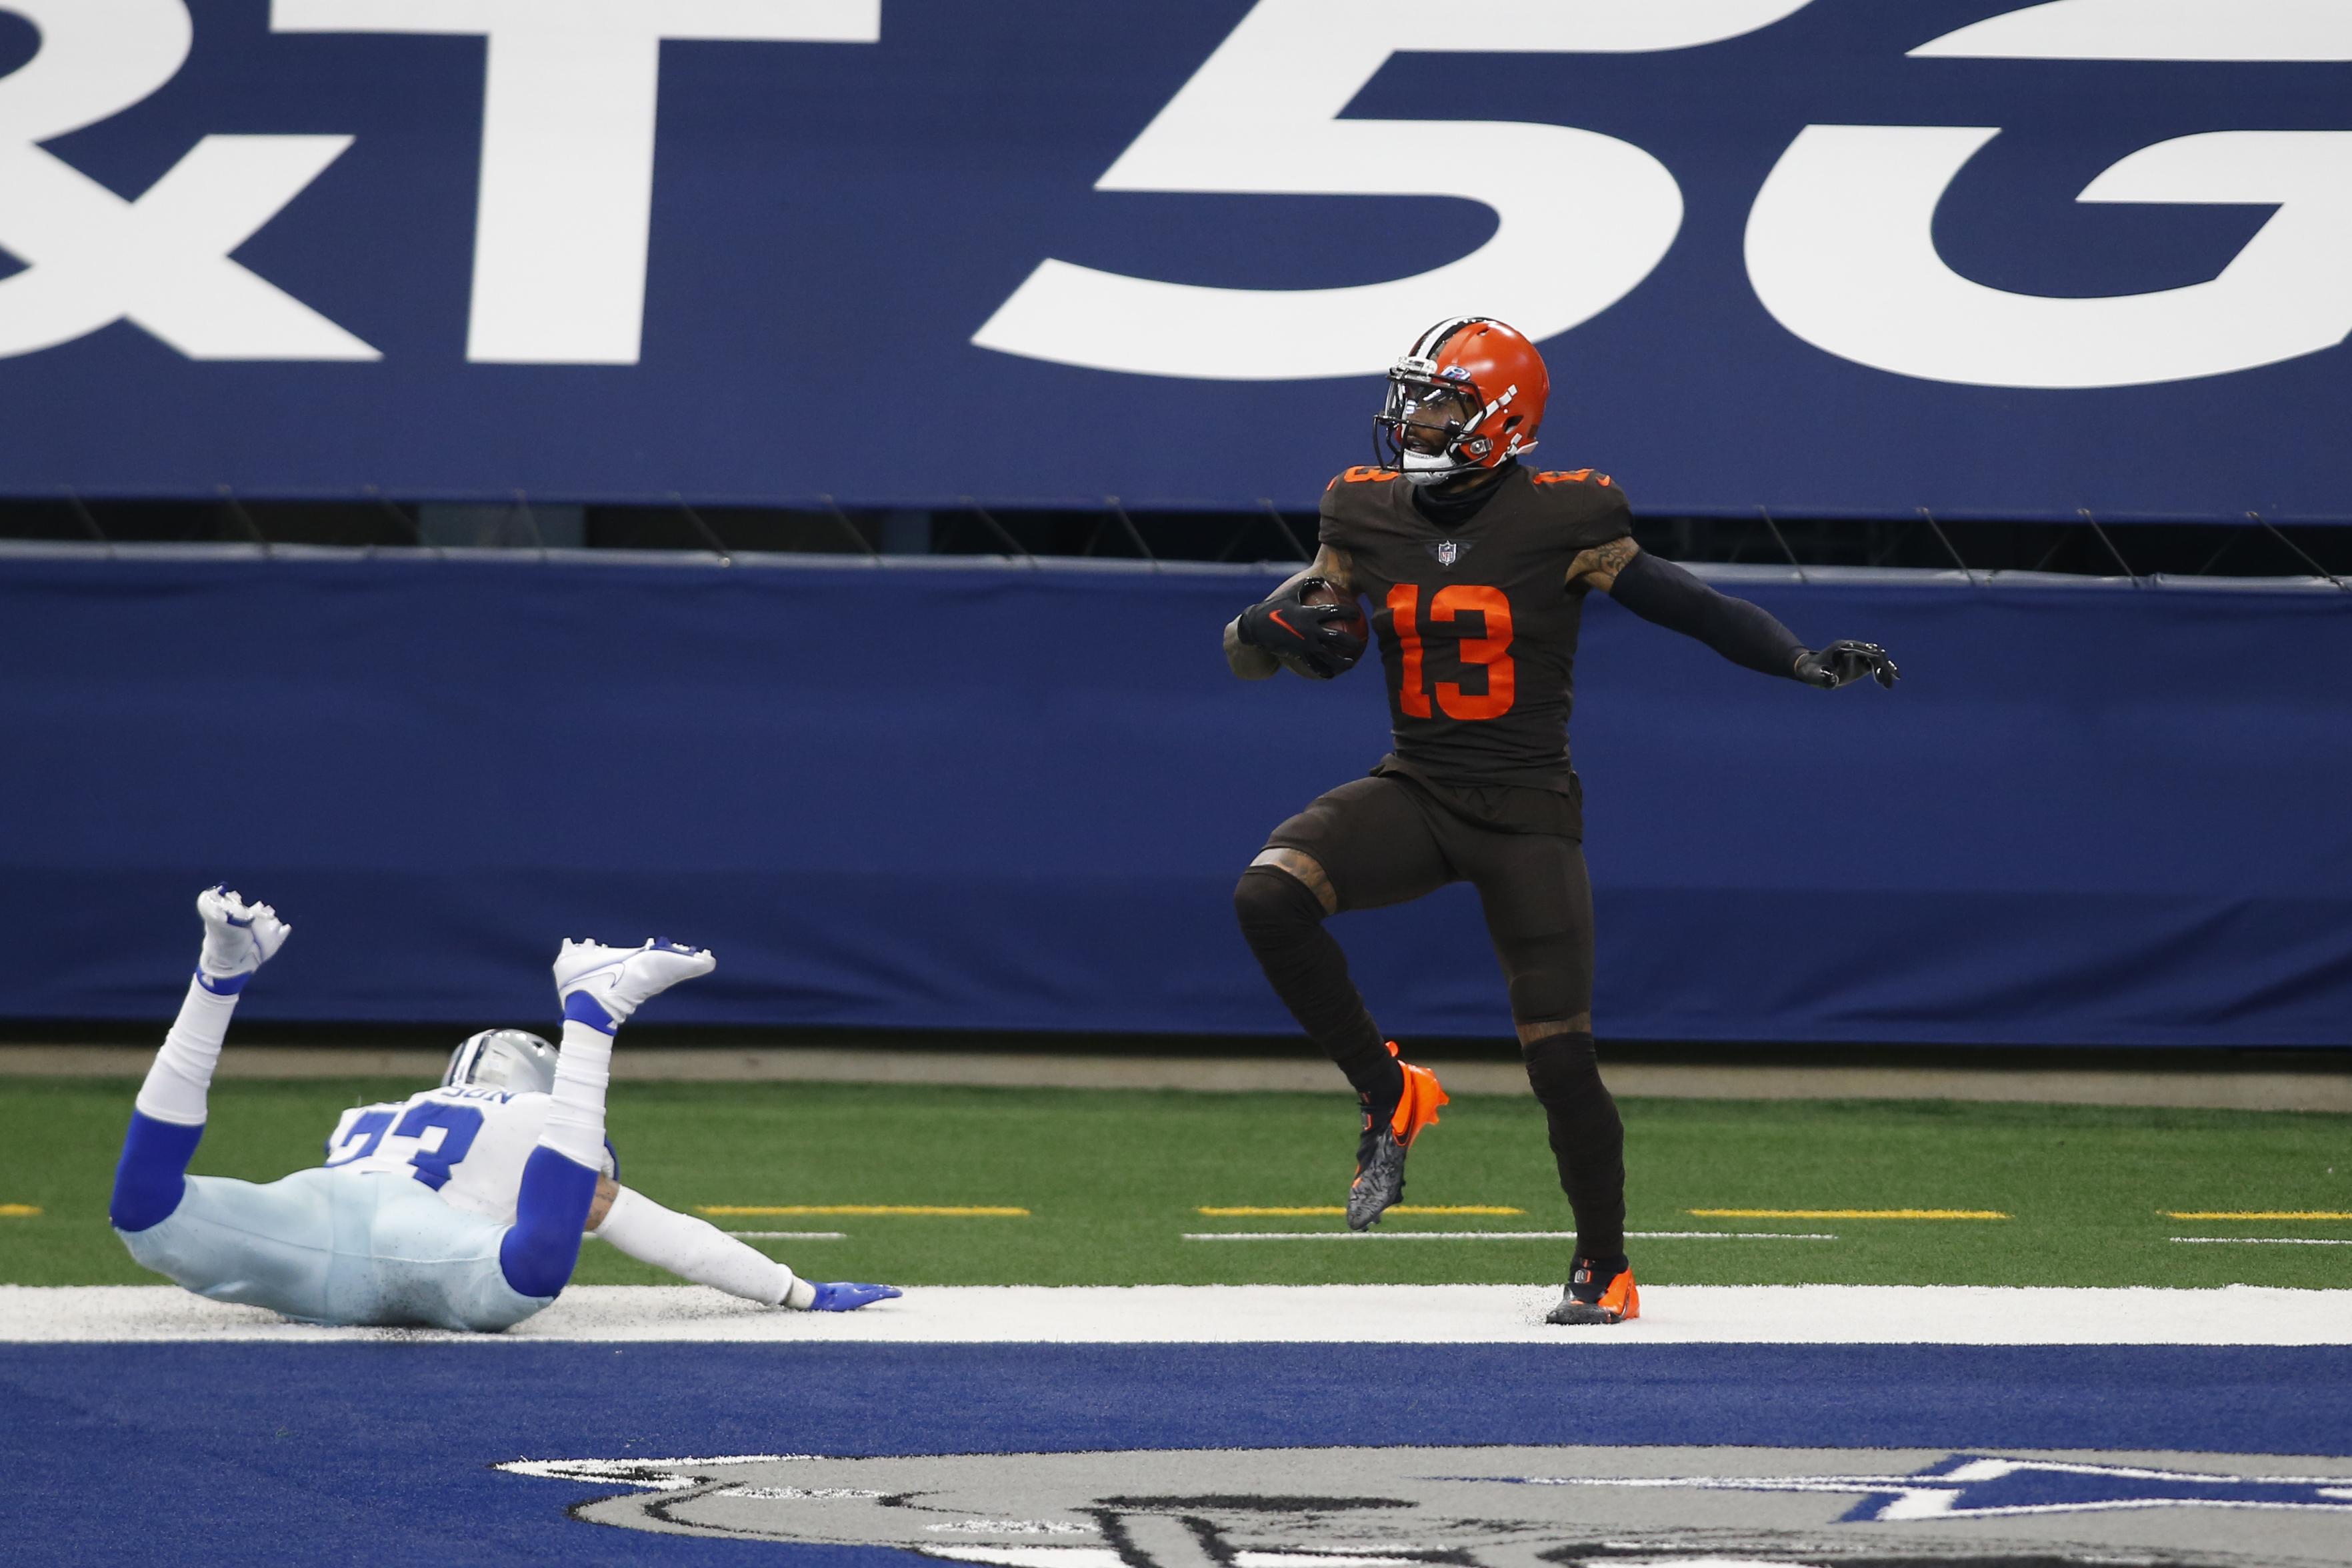 NFL: Cleveland Browns at Dallas Cowboys